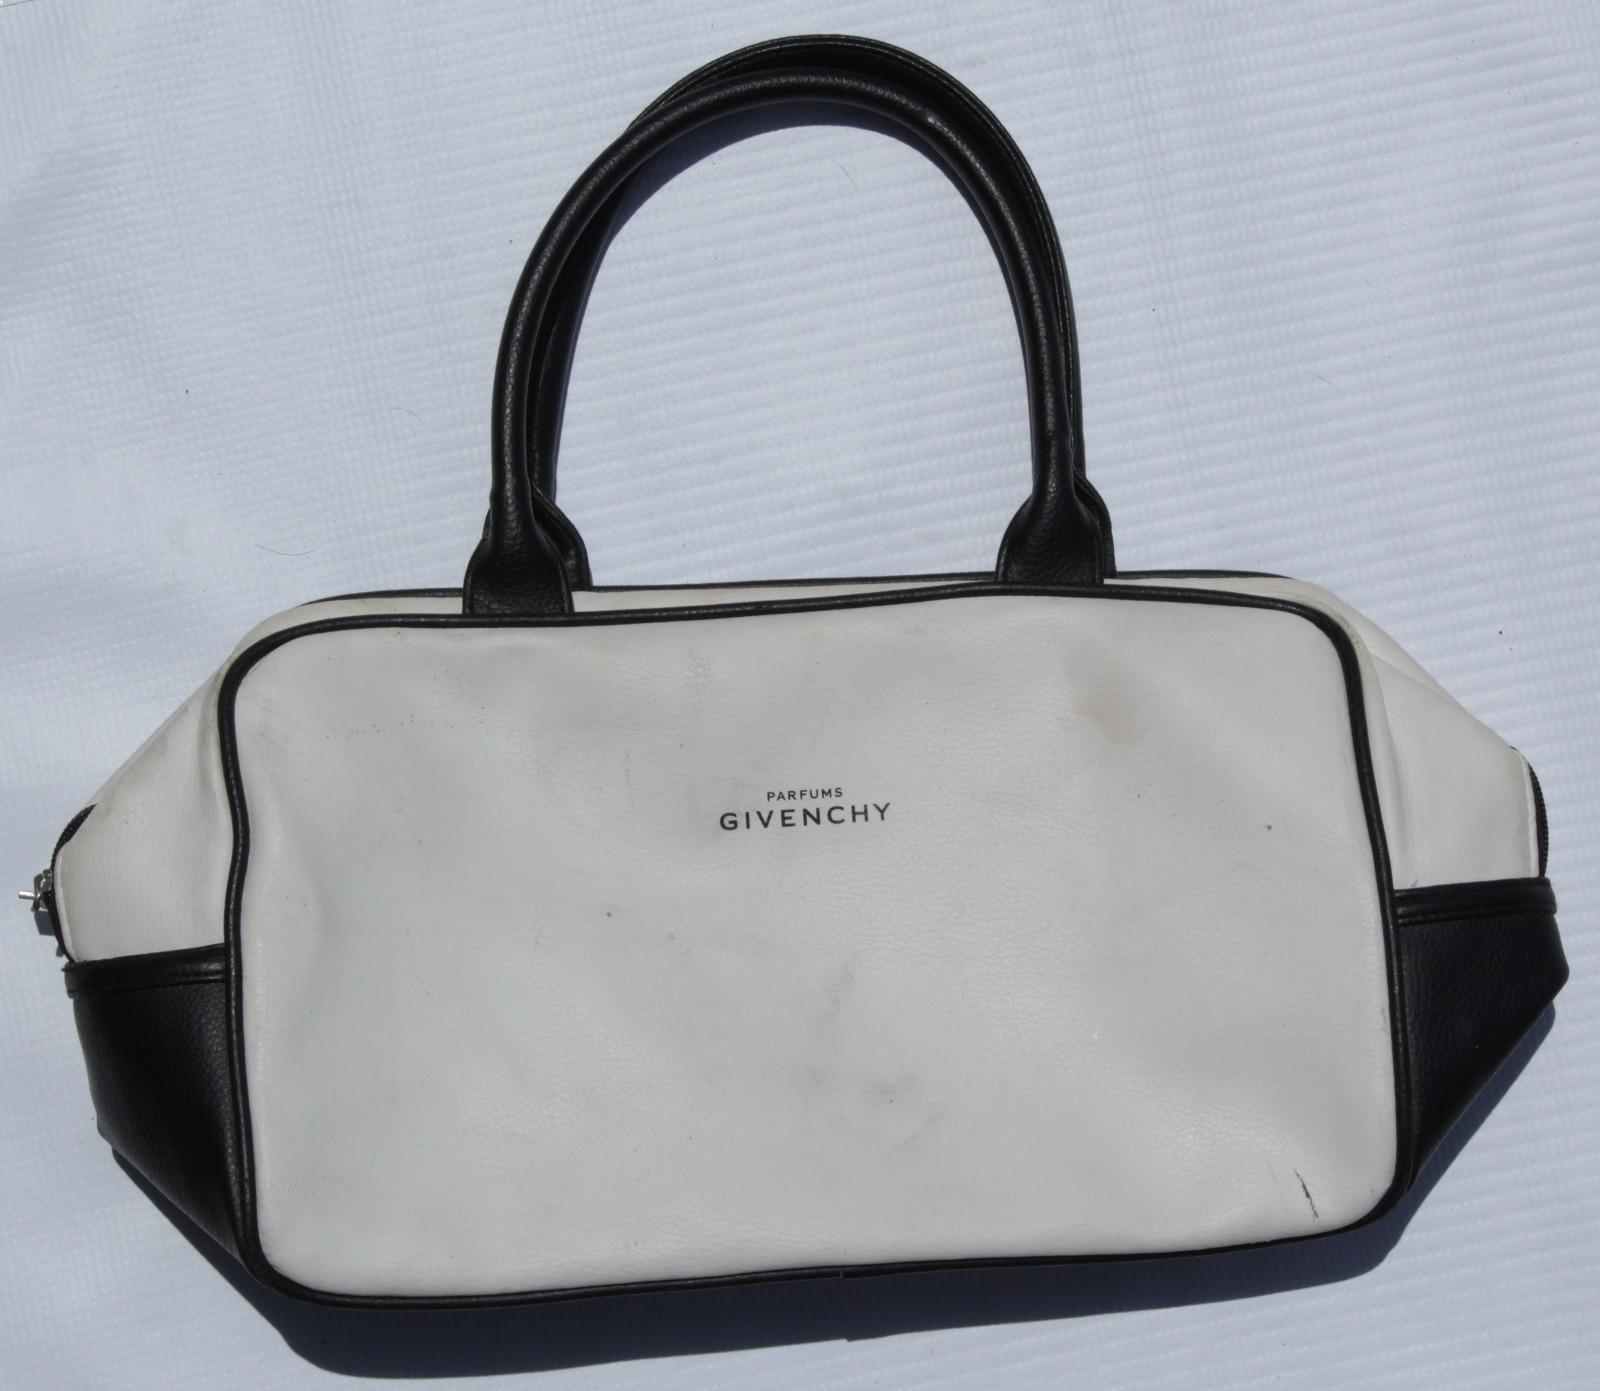 White Givenchy Handbag